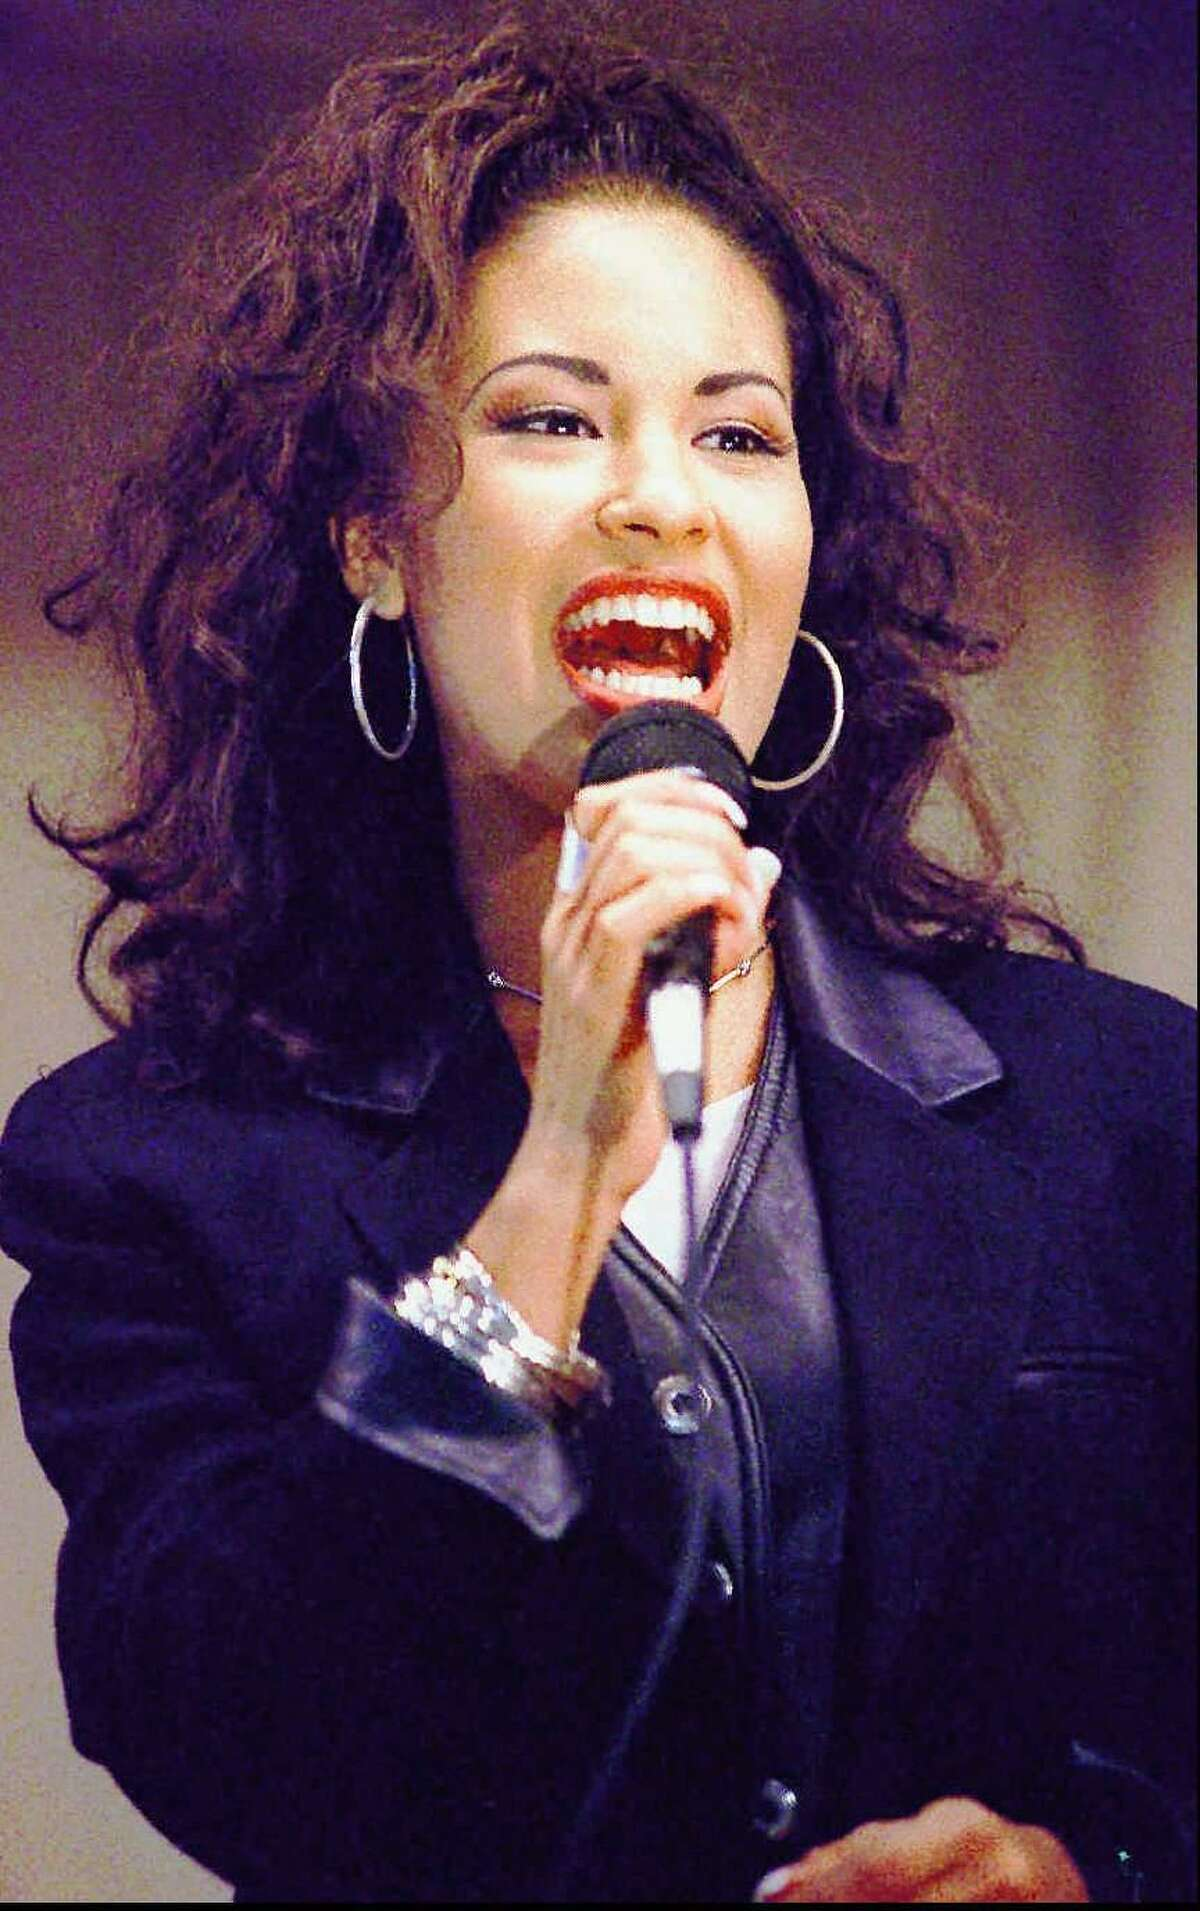 Tejano singer Selena Quintanilla-Perez sings at the Cunningham Elementary School in Corpus Christi Nov. 14, 1994.